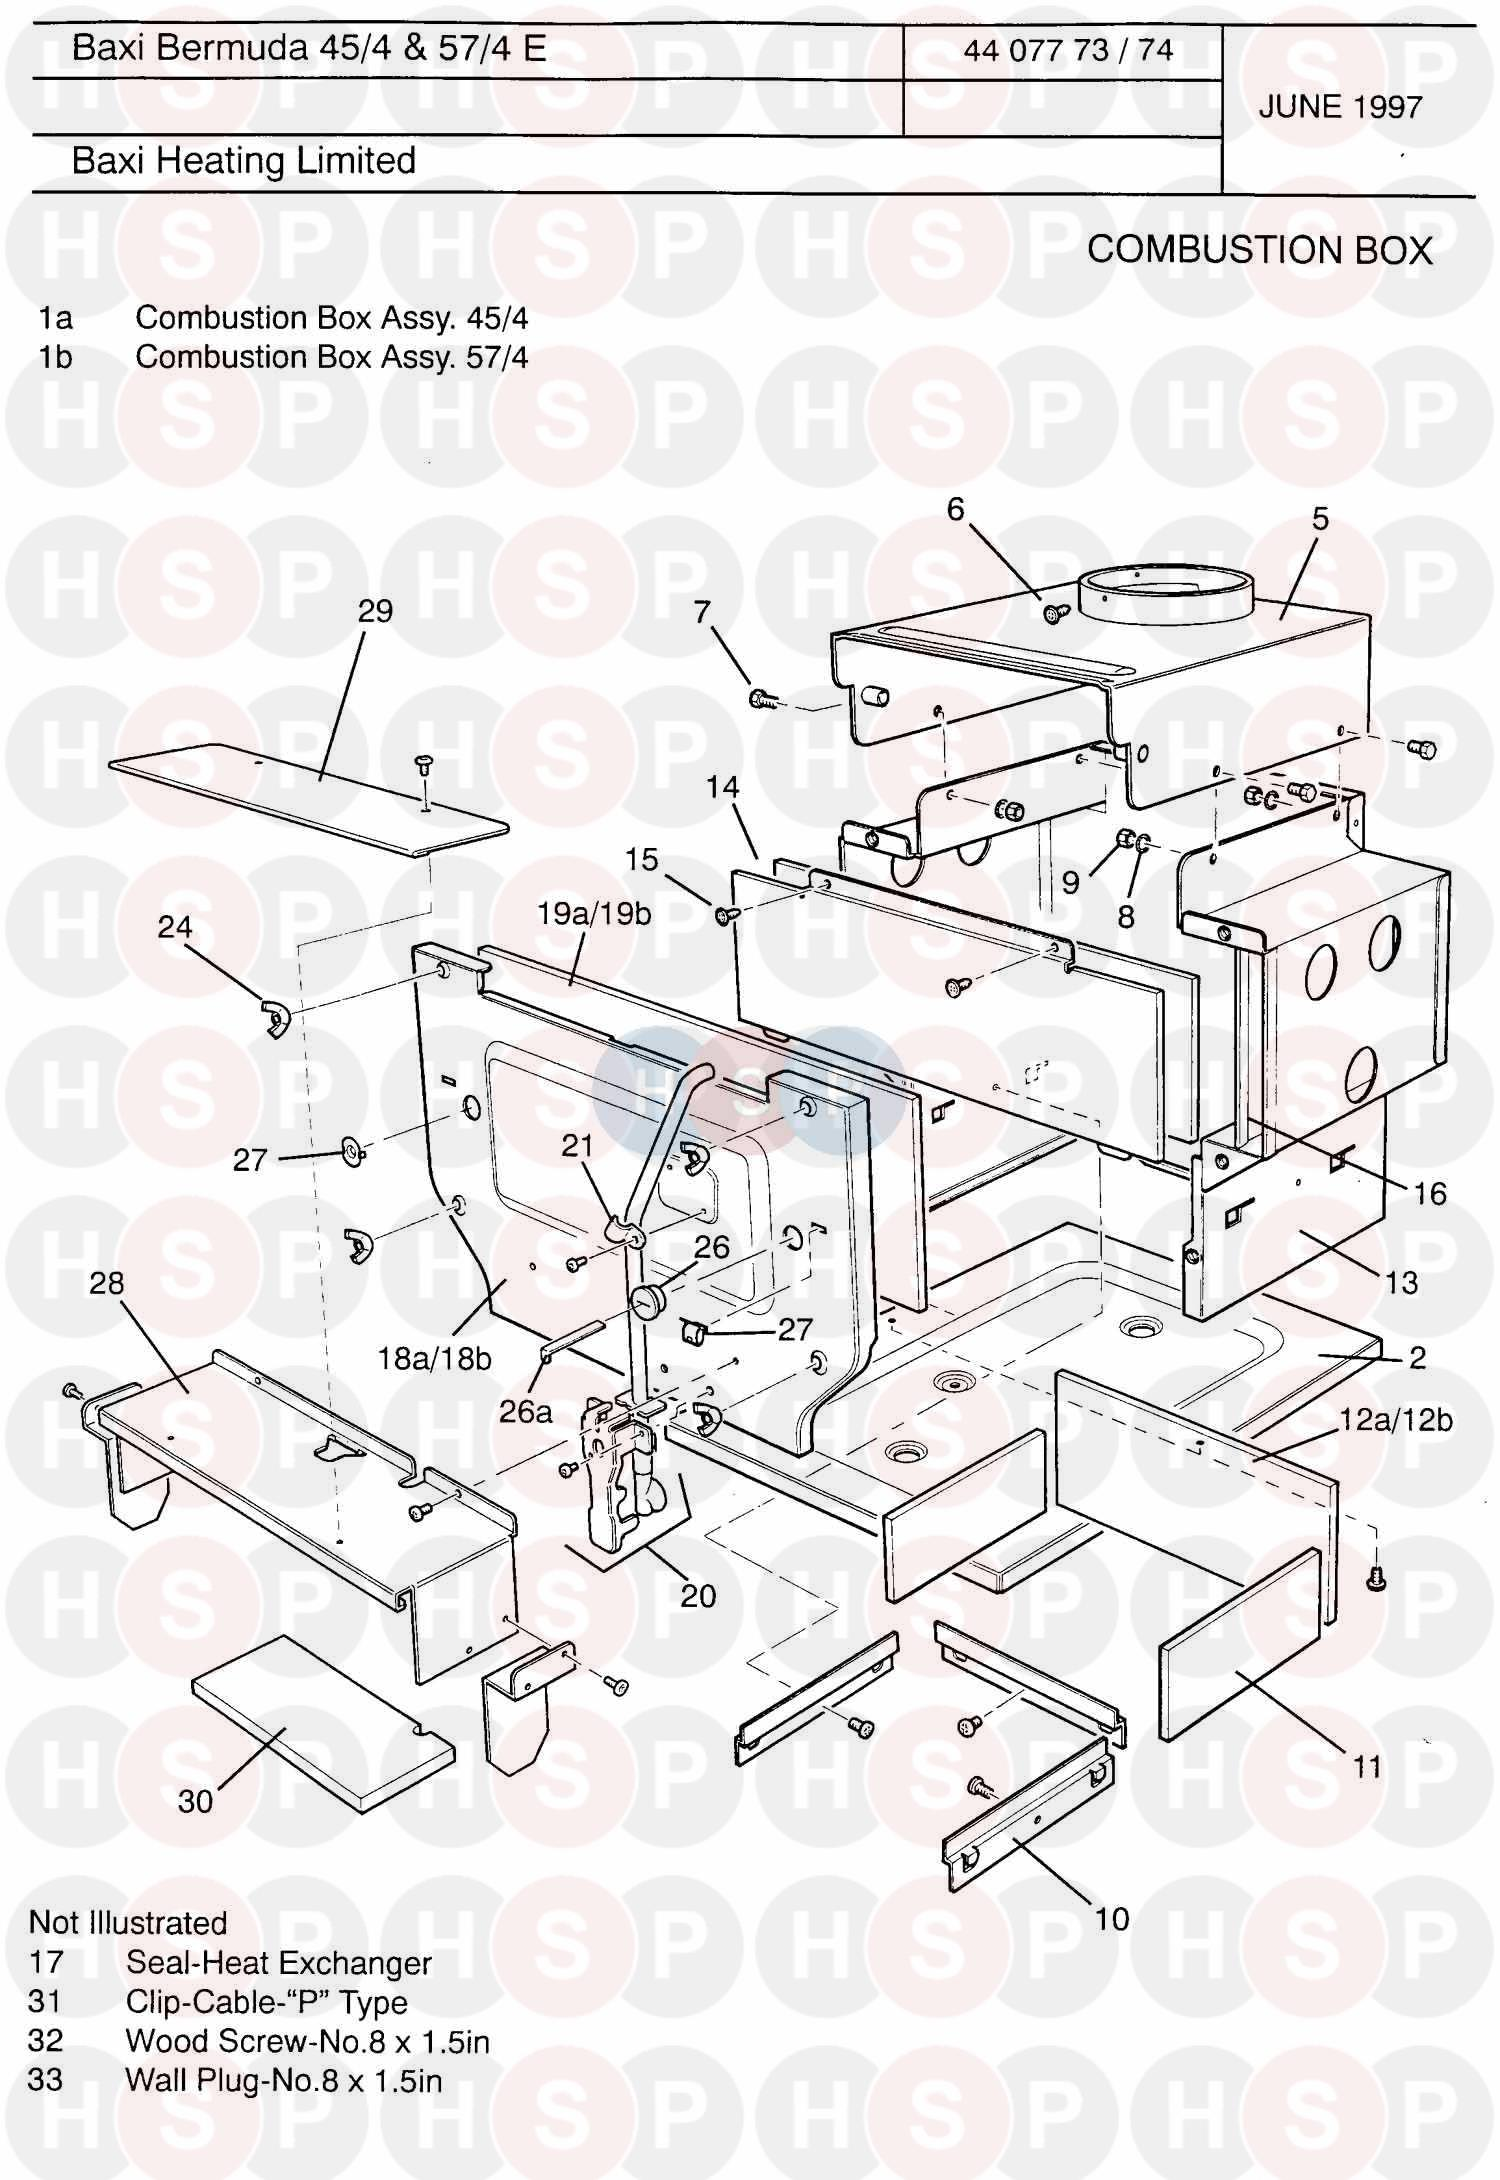 baxi bermuda 57  4 electronic  combustion box  diagram